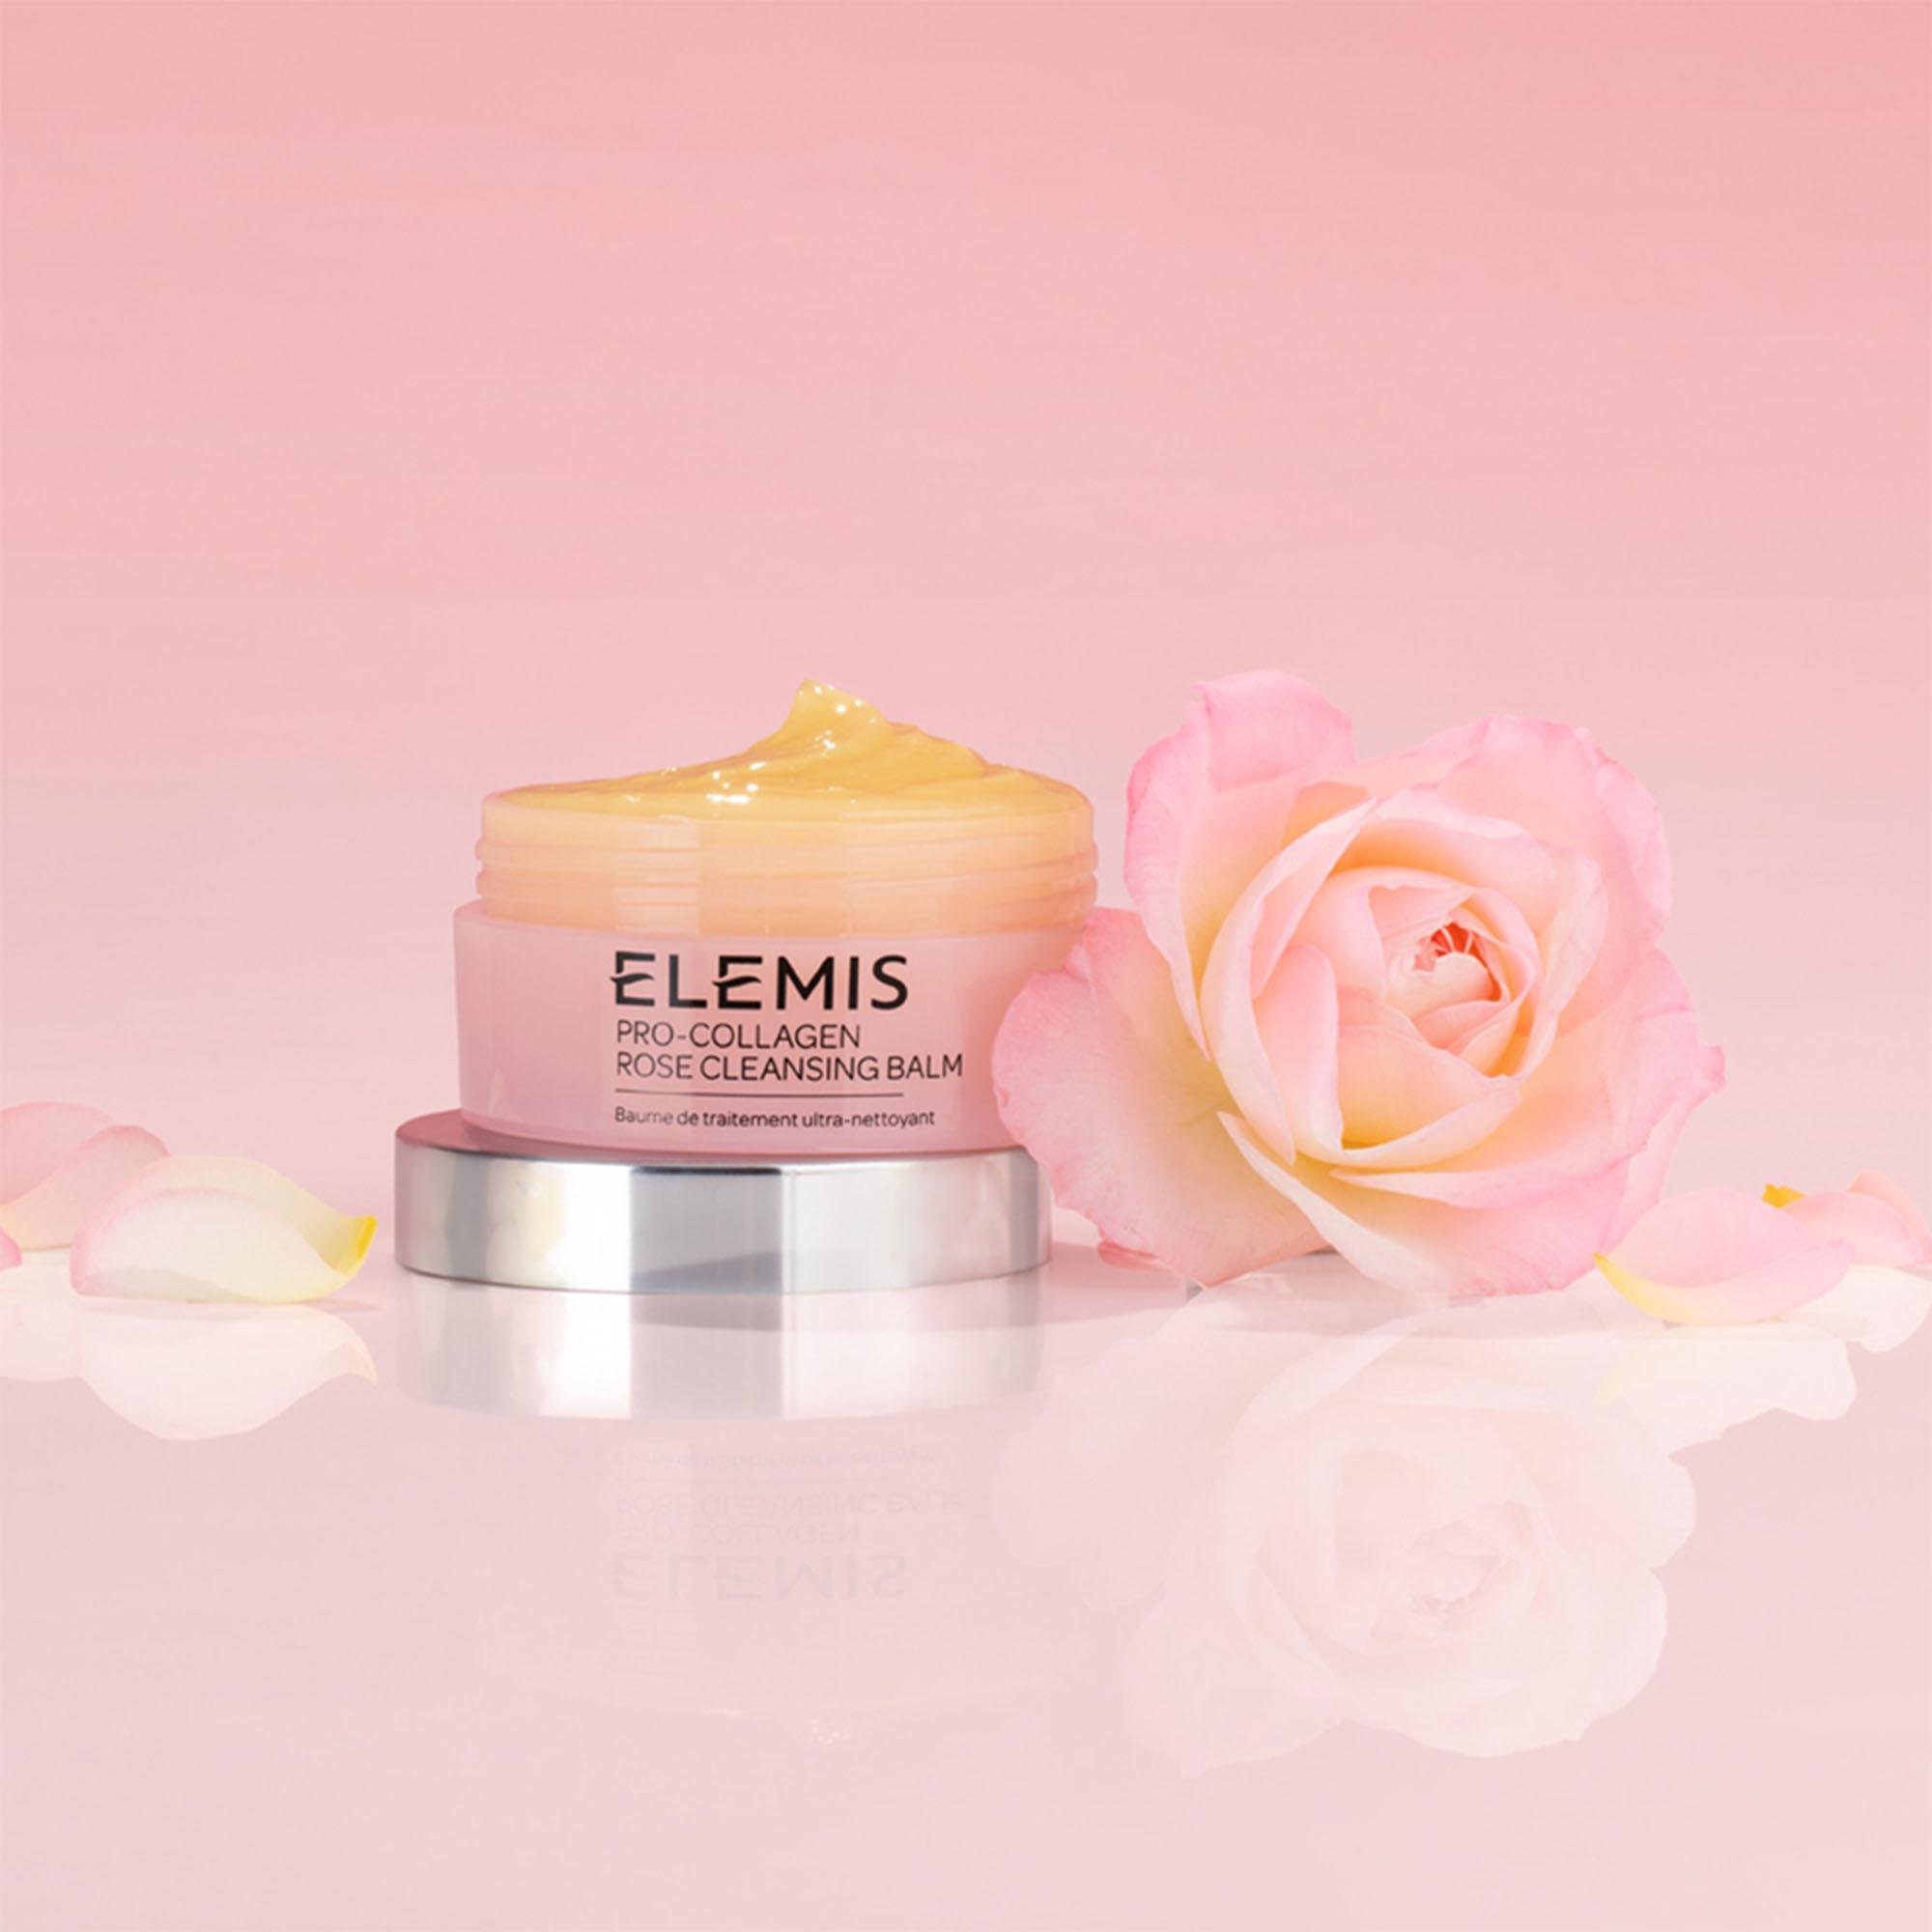 641628501731_ELEMIS_Pro-Collagen-Rose-Balm_Campaign-Image